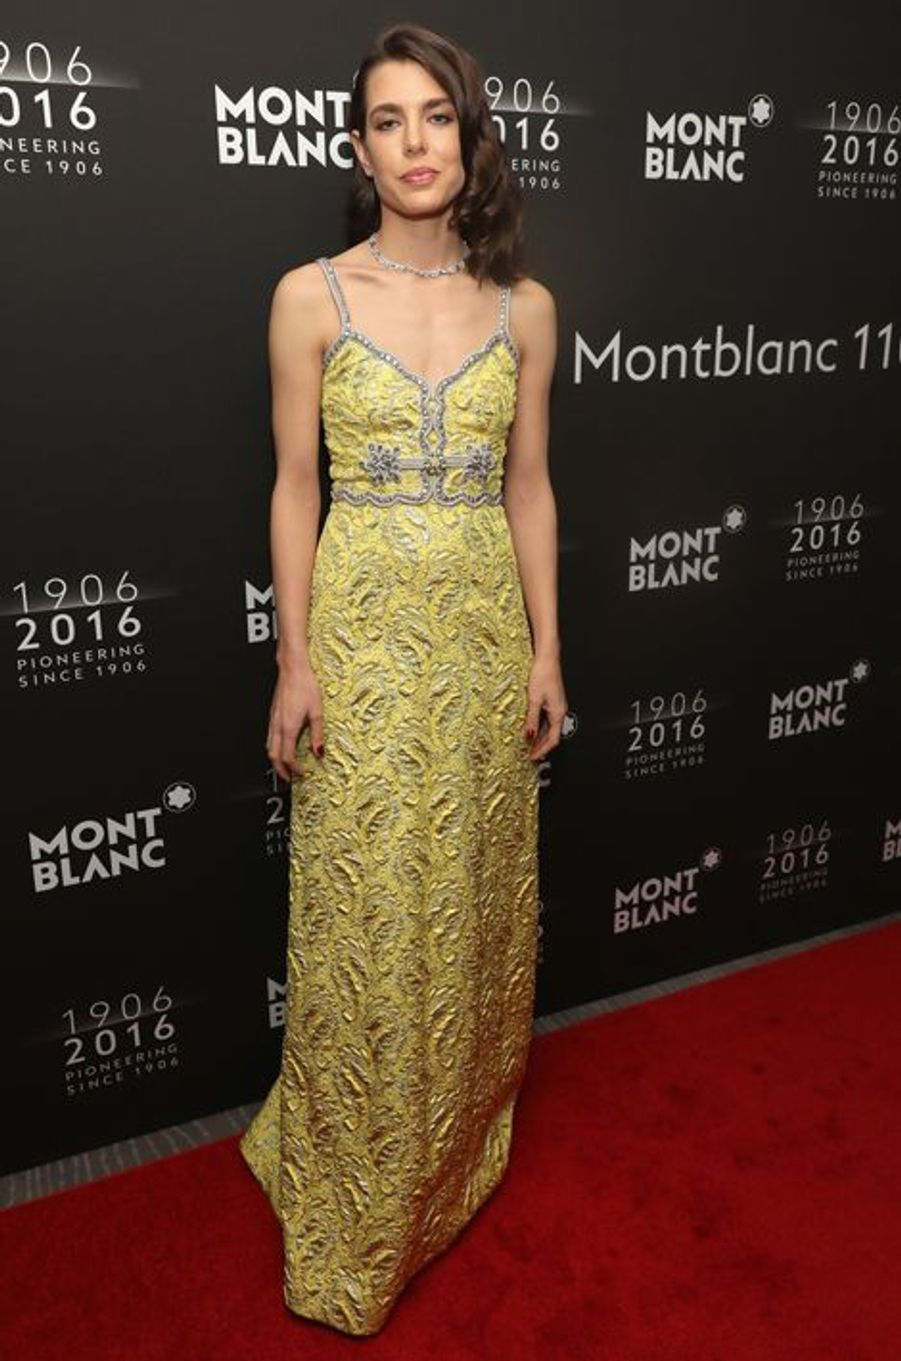 Charlotte Casiraghi au dîner de gala Montblanc à New York, le 5 avril 2016